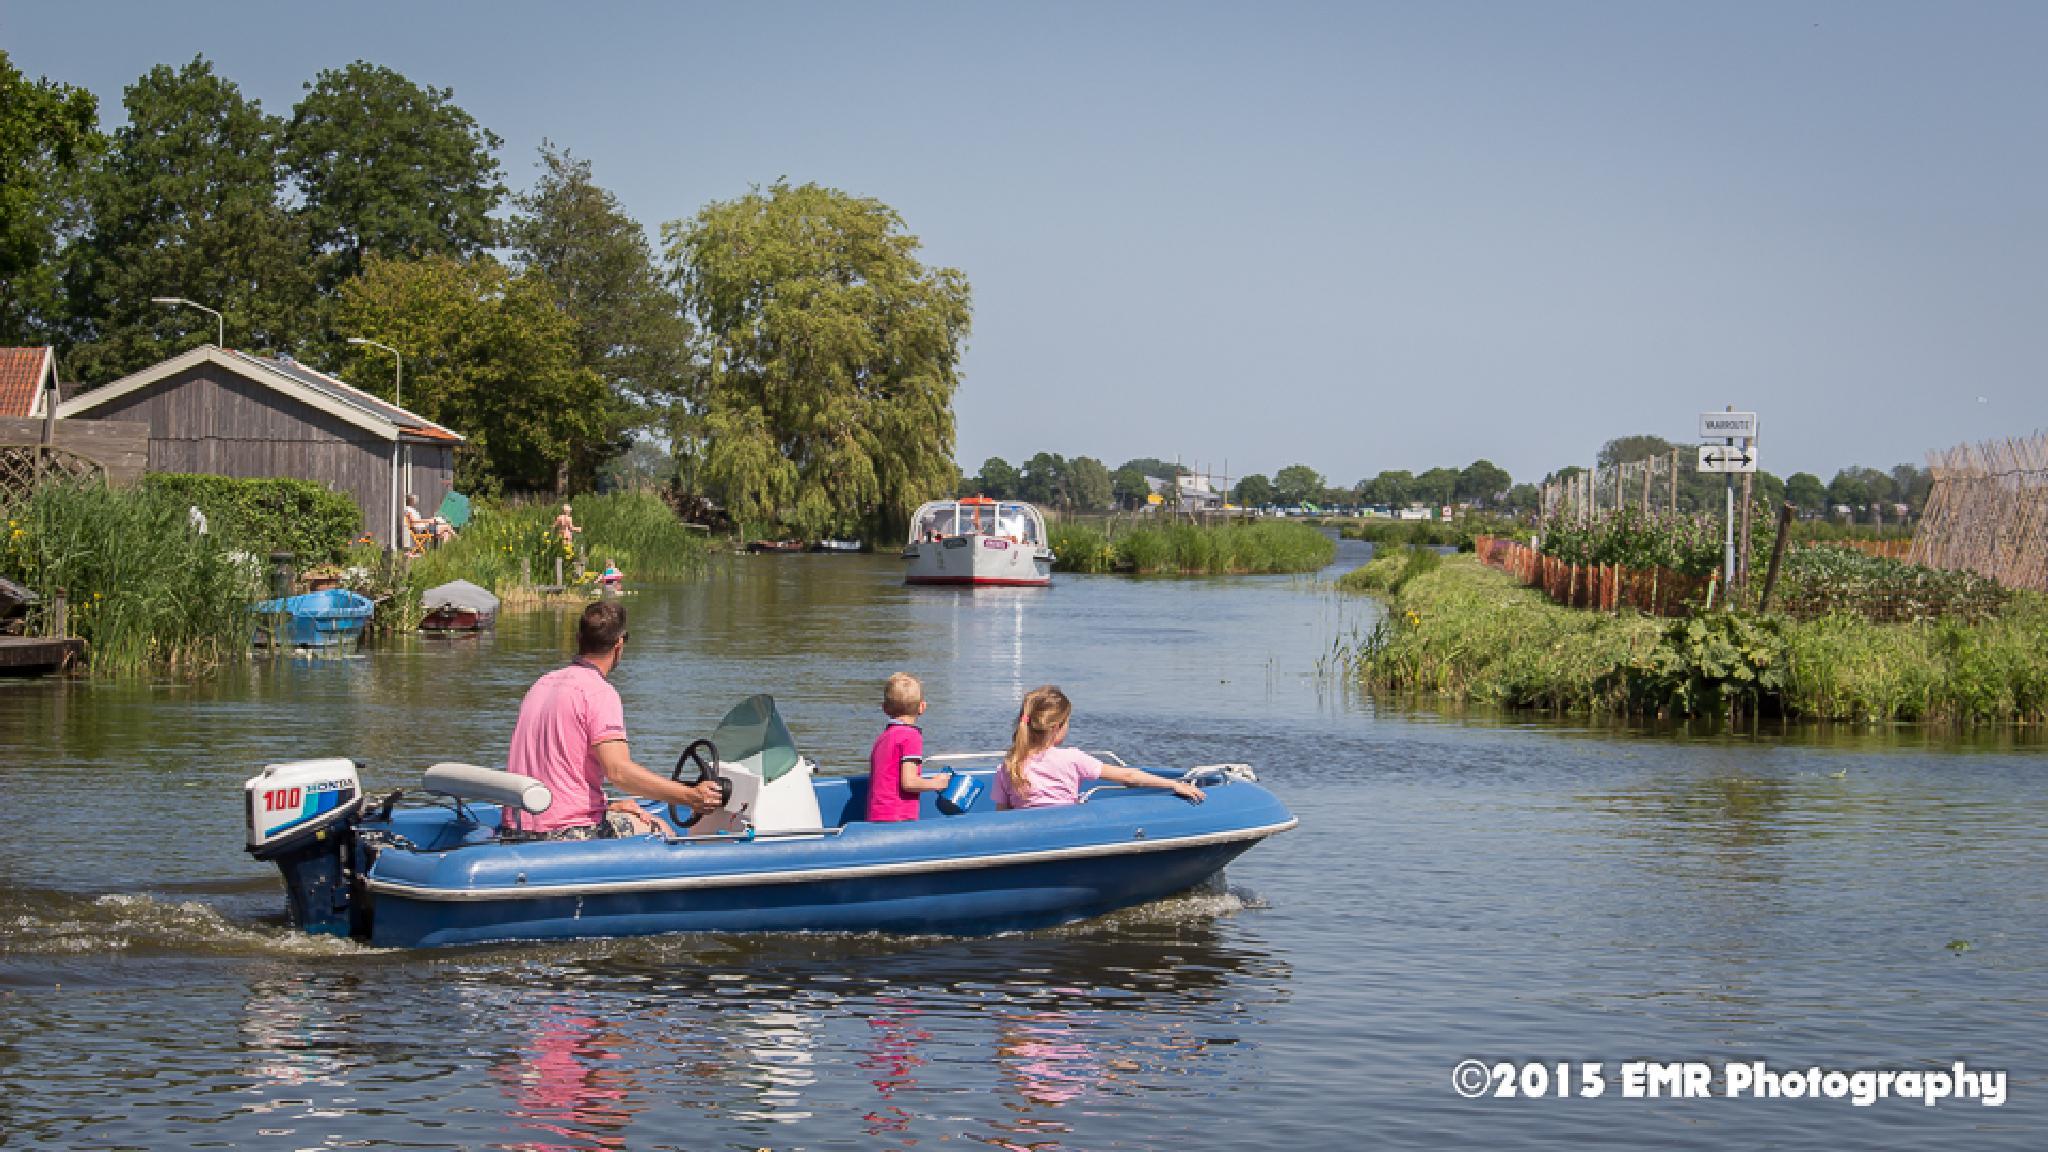 Langedijk - Nederland by EMR Photography & Fotomodel Marijn